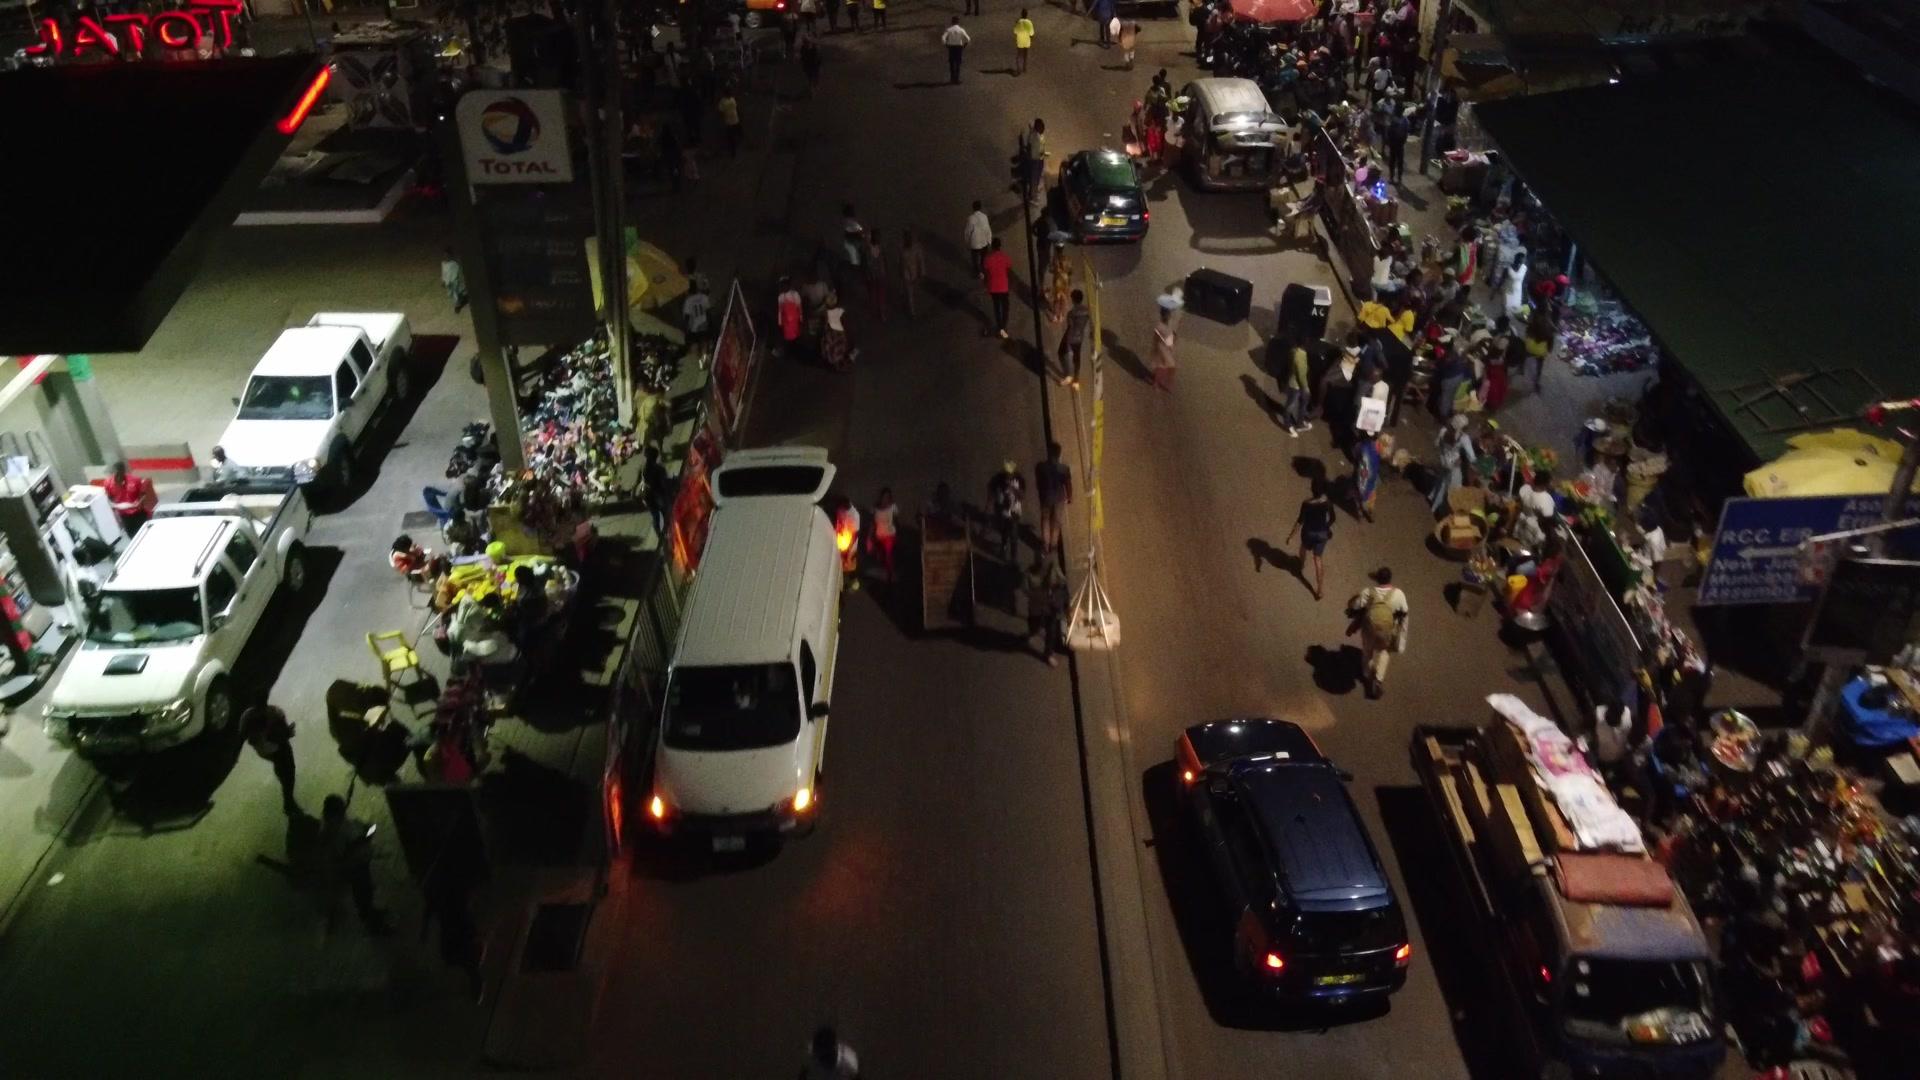 Koforidua Busy Road Crowded Traders Shopping